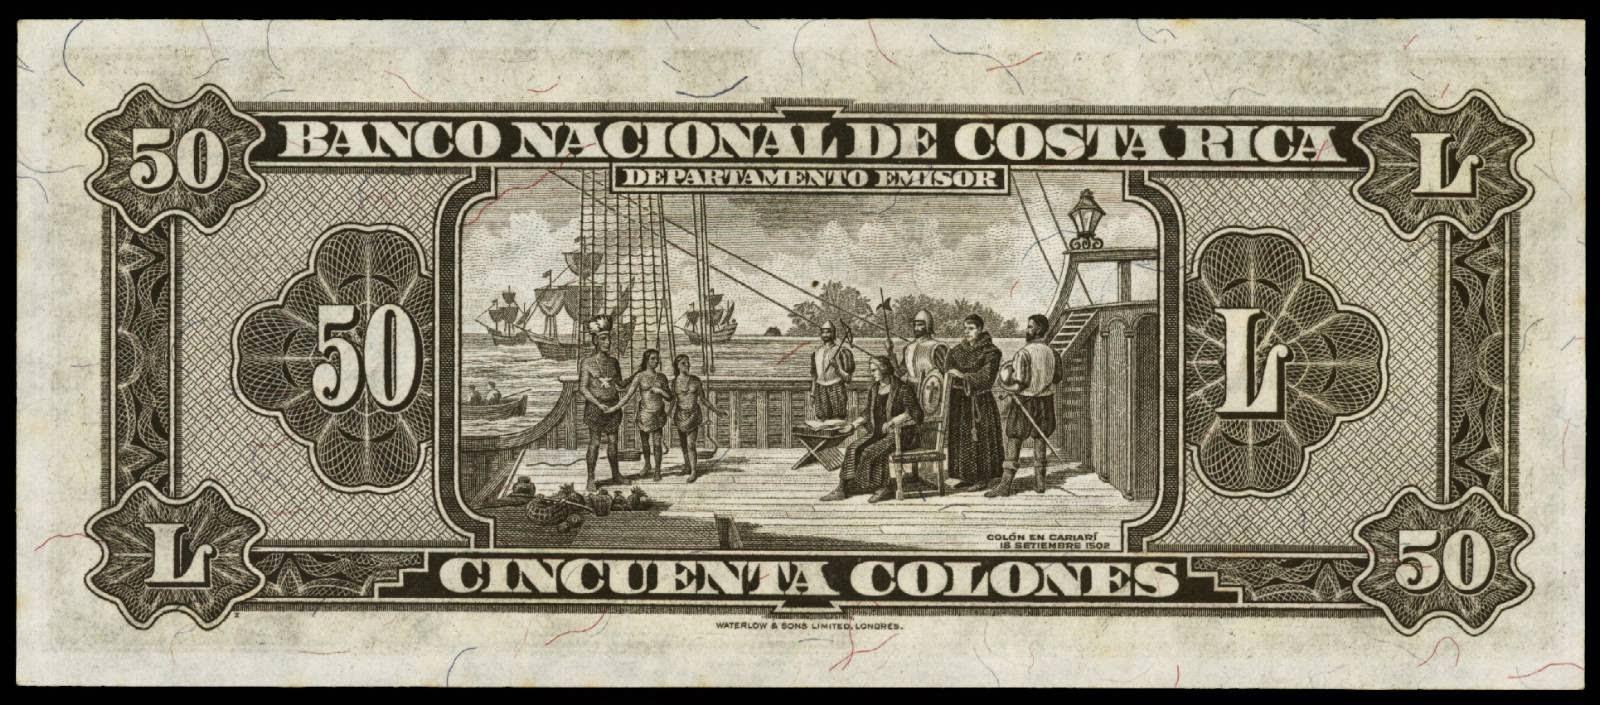 Costa Rica banknotes 50 Colones 1942 Christopher Columbus at Cariari 1502